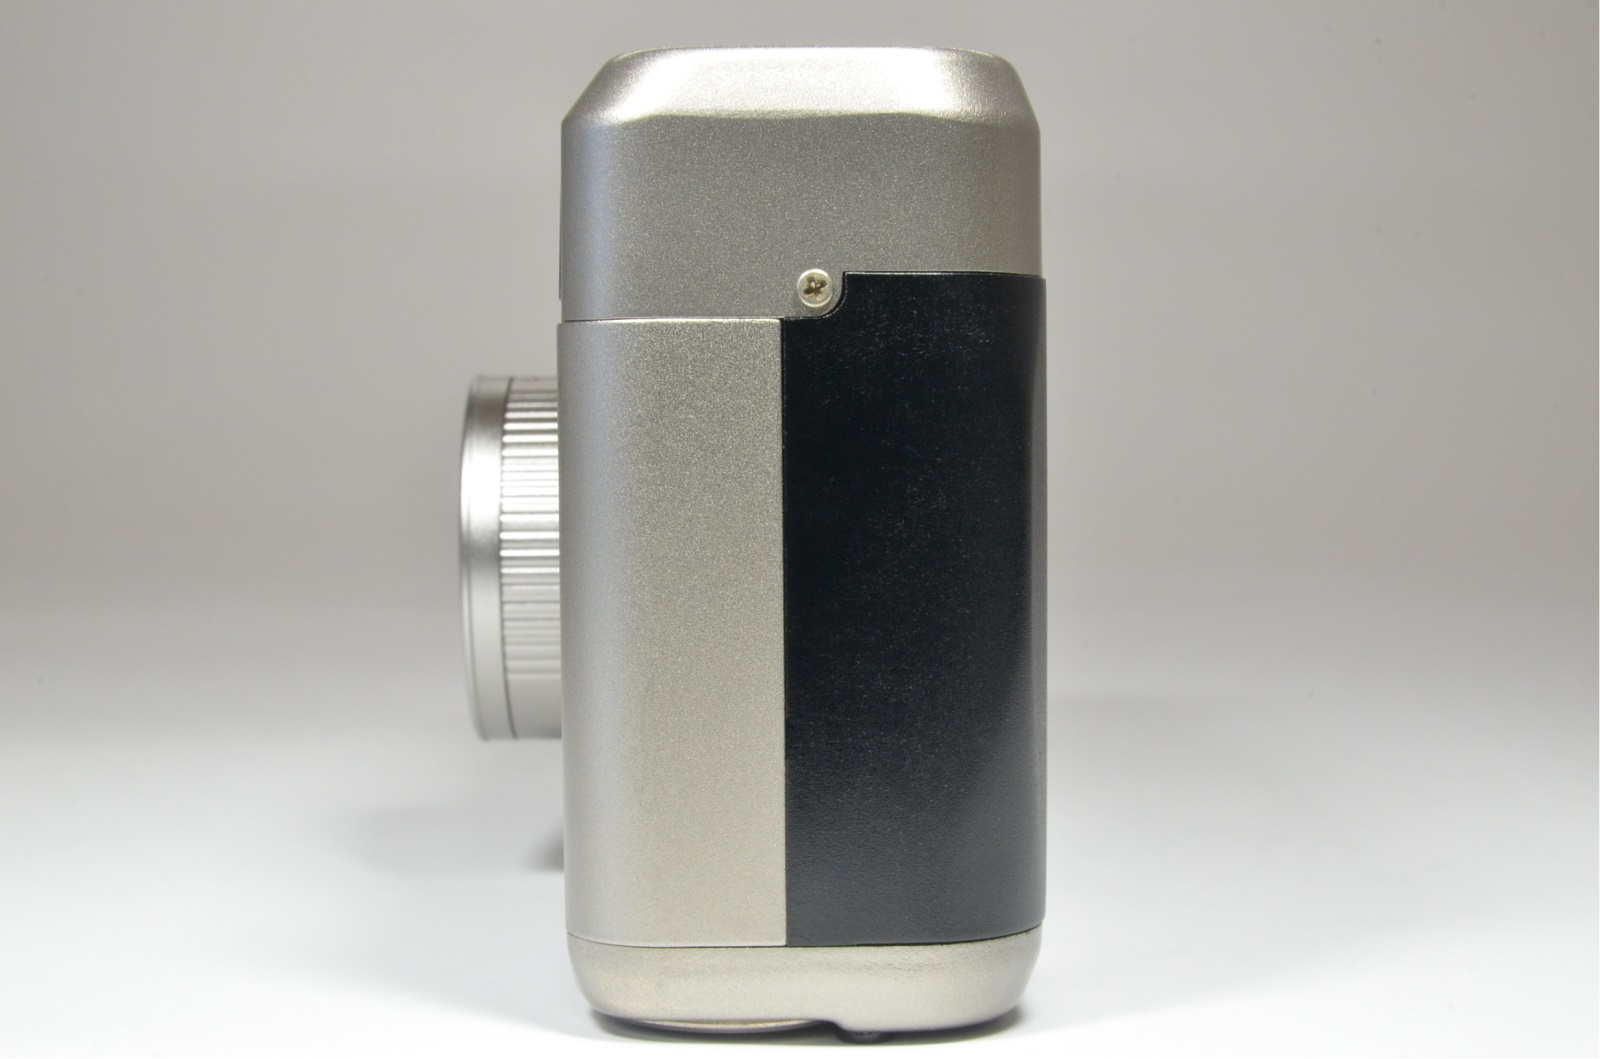 contax t2 titanium silver 35mm film camera with semi hard case